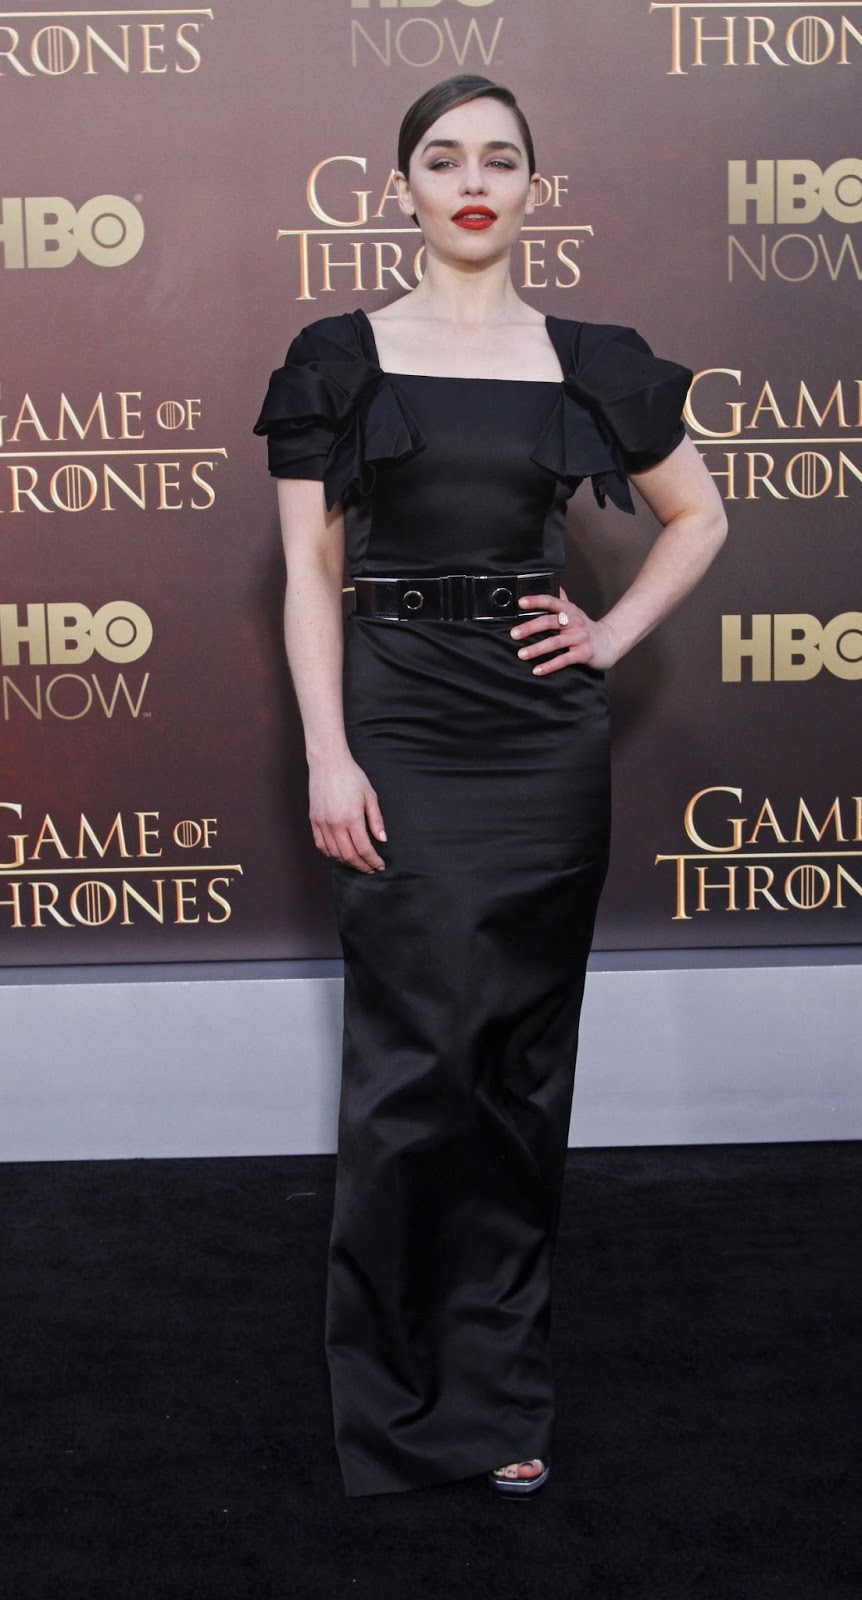 Emiia Clarke at the 'Game of Thrones' Season 5 premiere in San Francisco